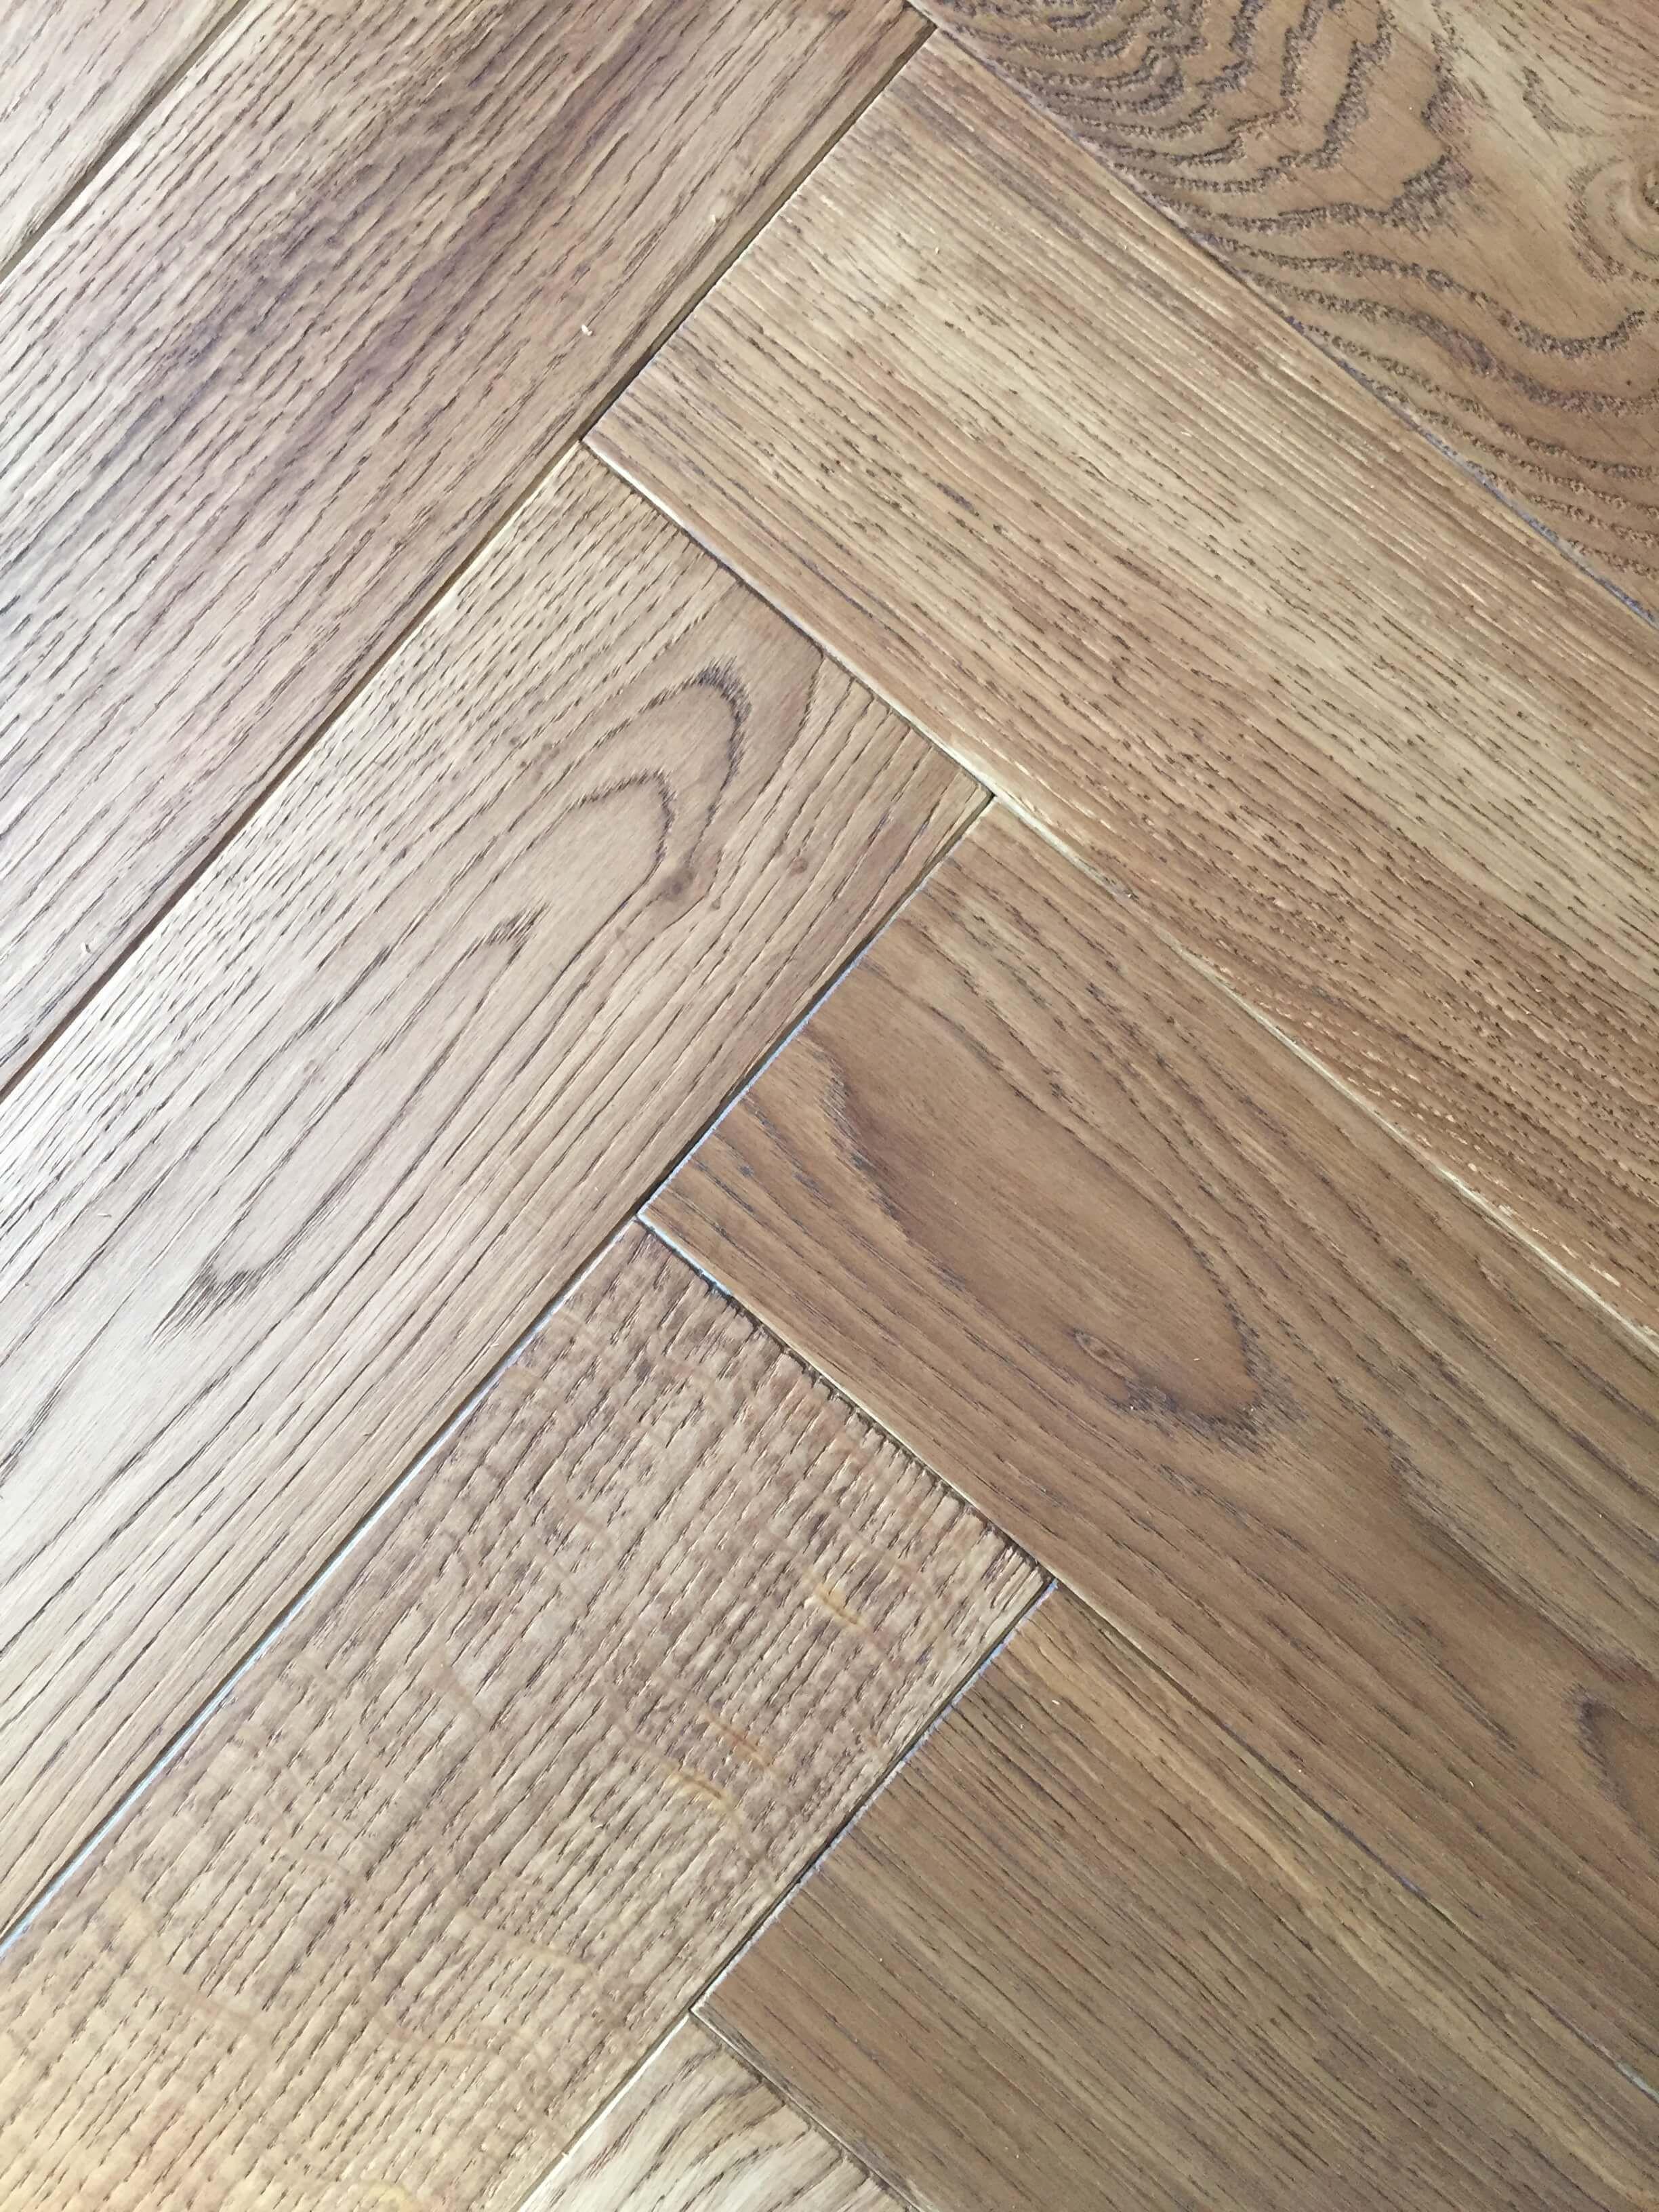 hardwood floor restoration before and after of elegant hardwood floor repairs inspiration throughout hardwood floor repair new decorating an open floor plan living room awesome design plan 0d